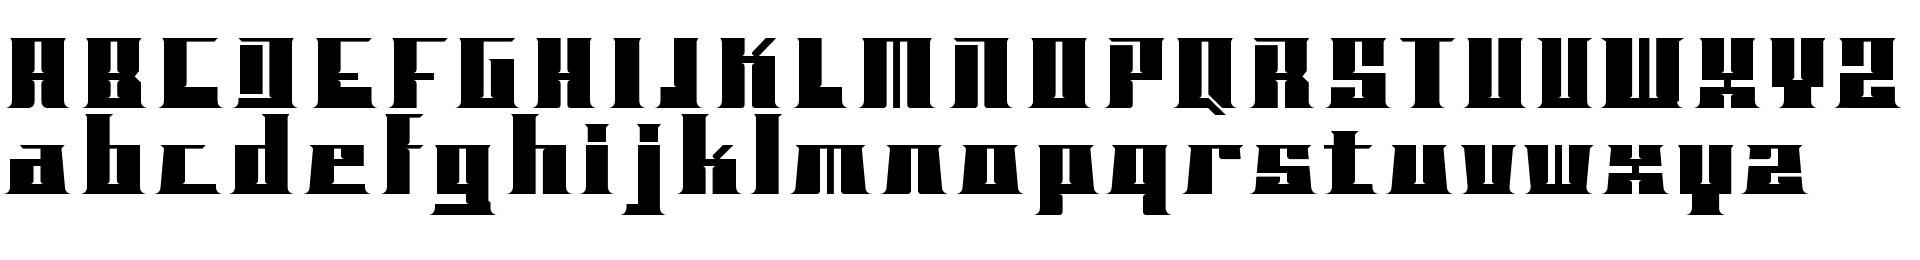 BLOCKO typeface